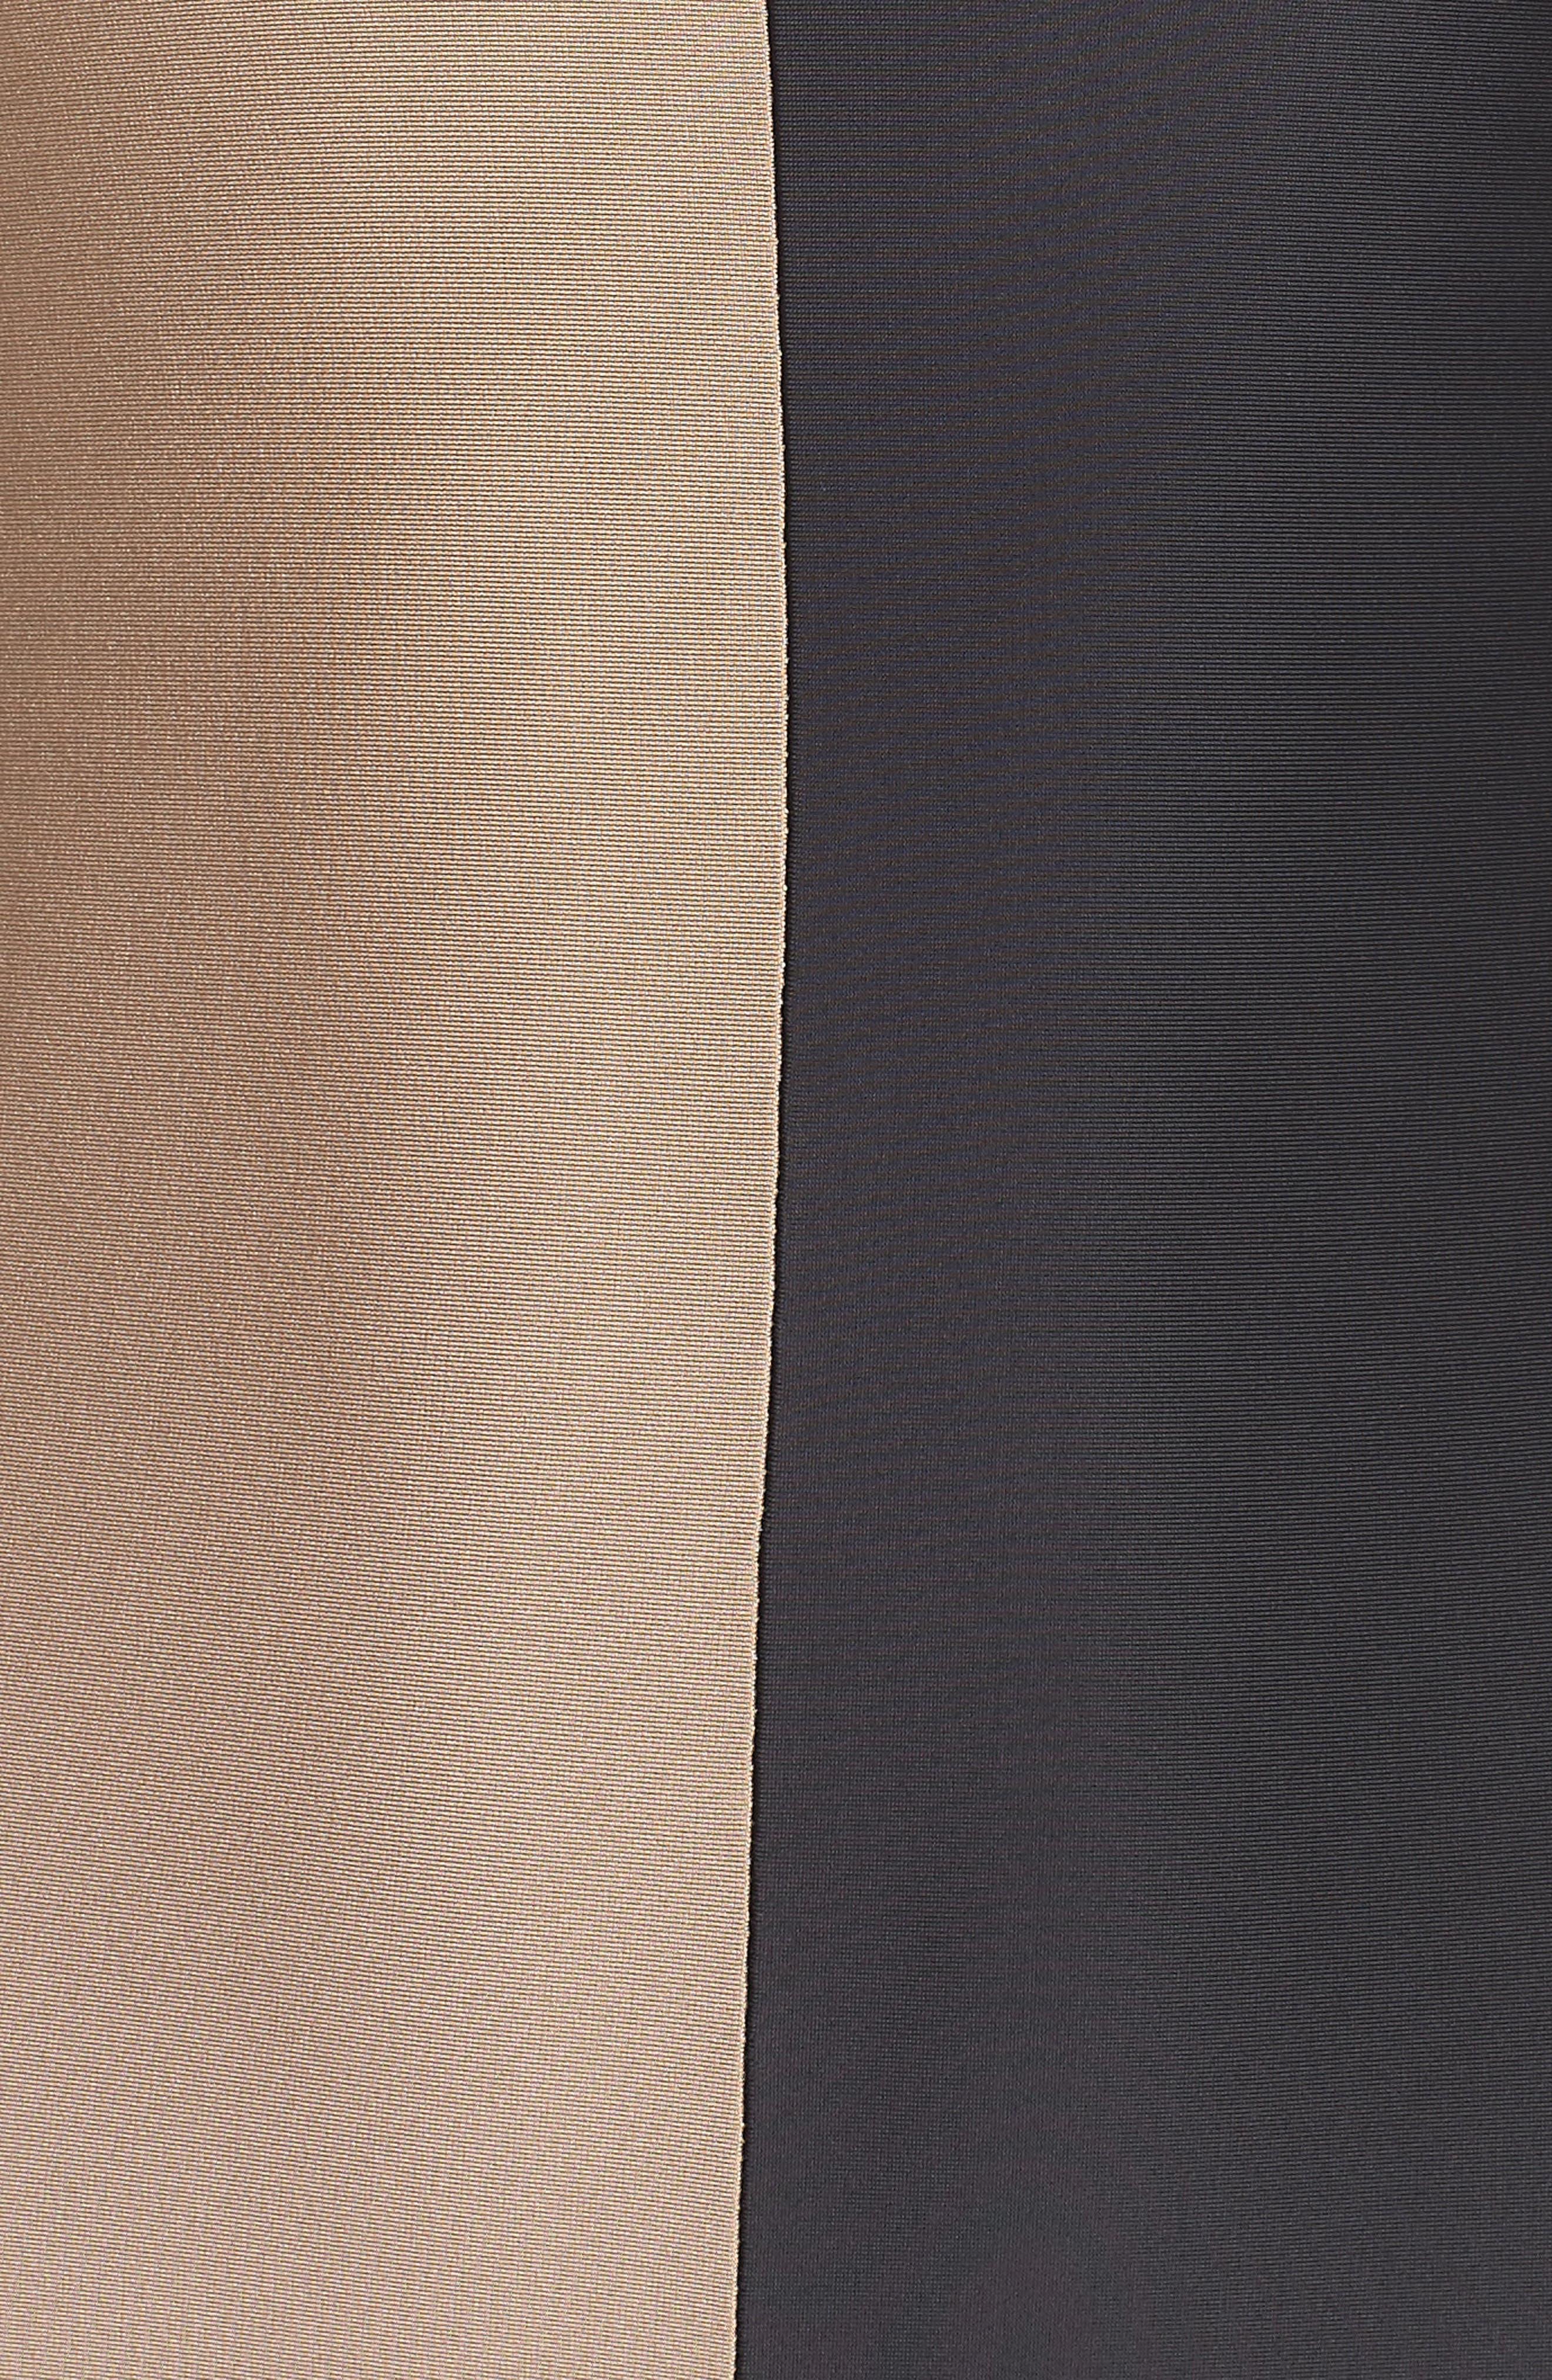 Farrah One-Piece Swimsuit,                             Alternate thumbnail 4, color,                             Cadillac